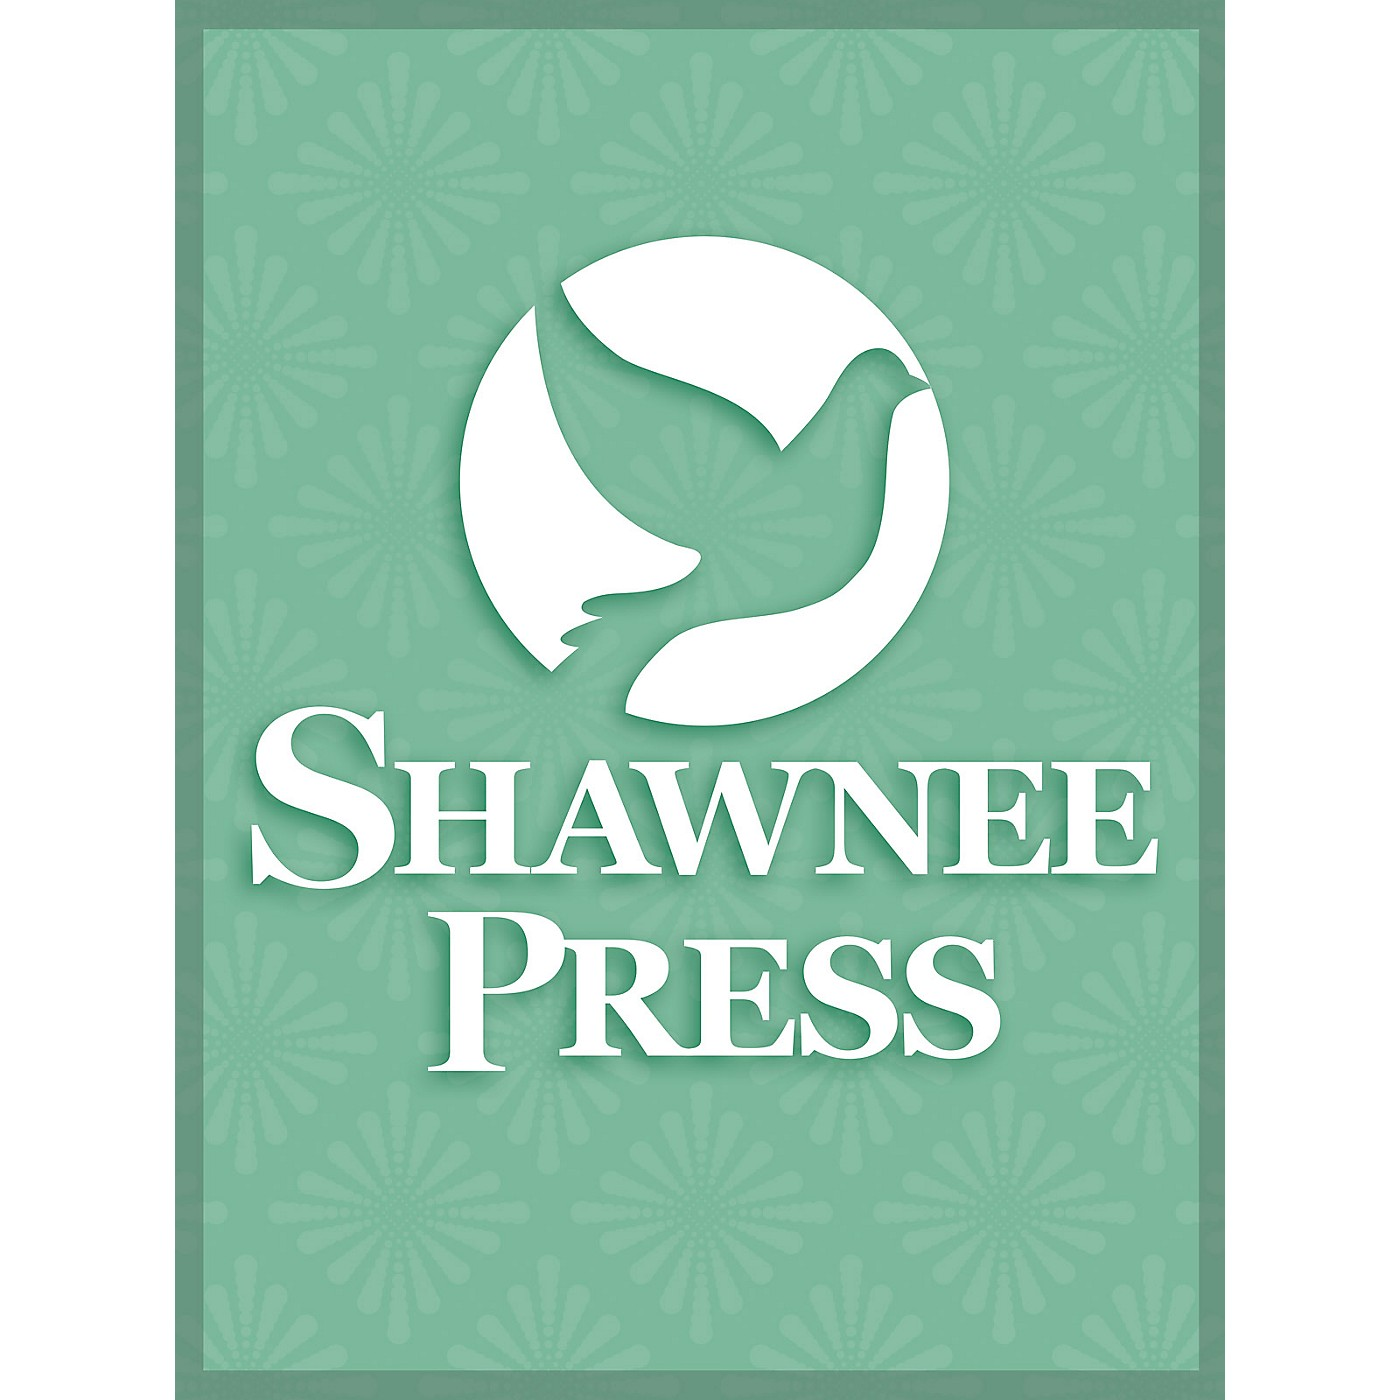 Shawnee Press Suite for Saxophone Quartet (Full Score) Shawnee Press Series  by Creston thumbnail